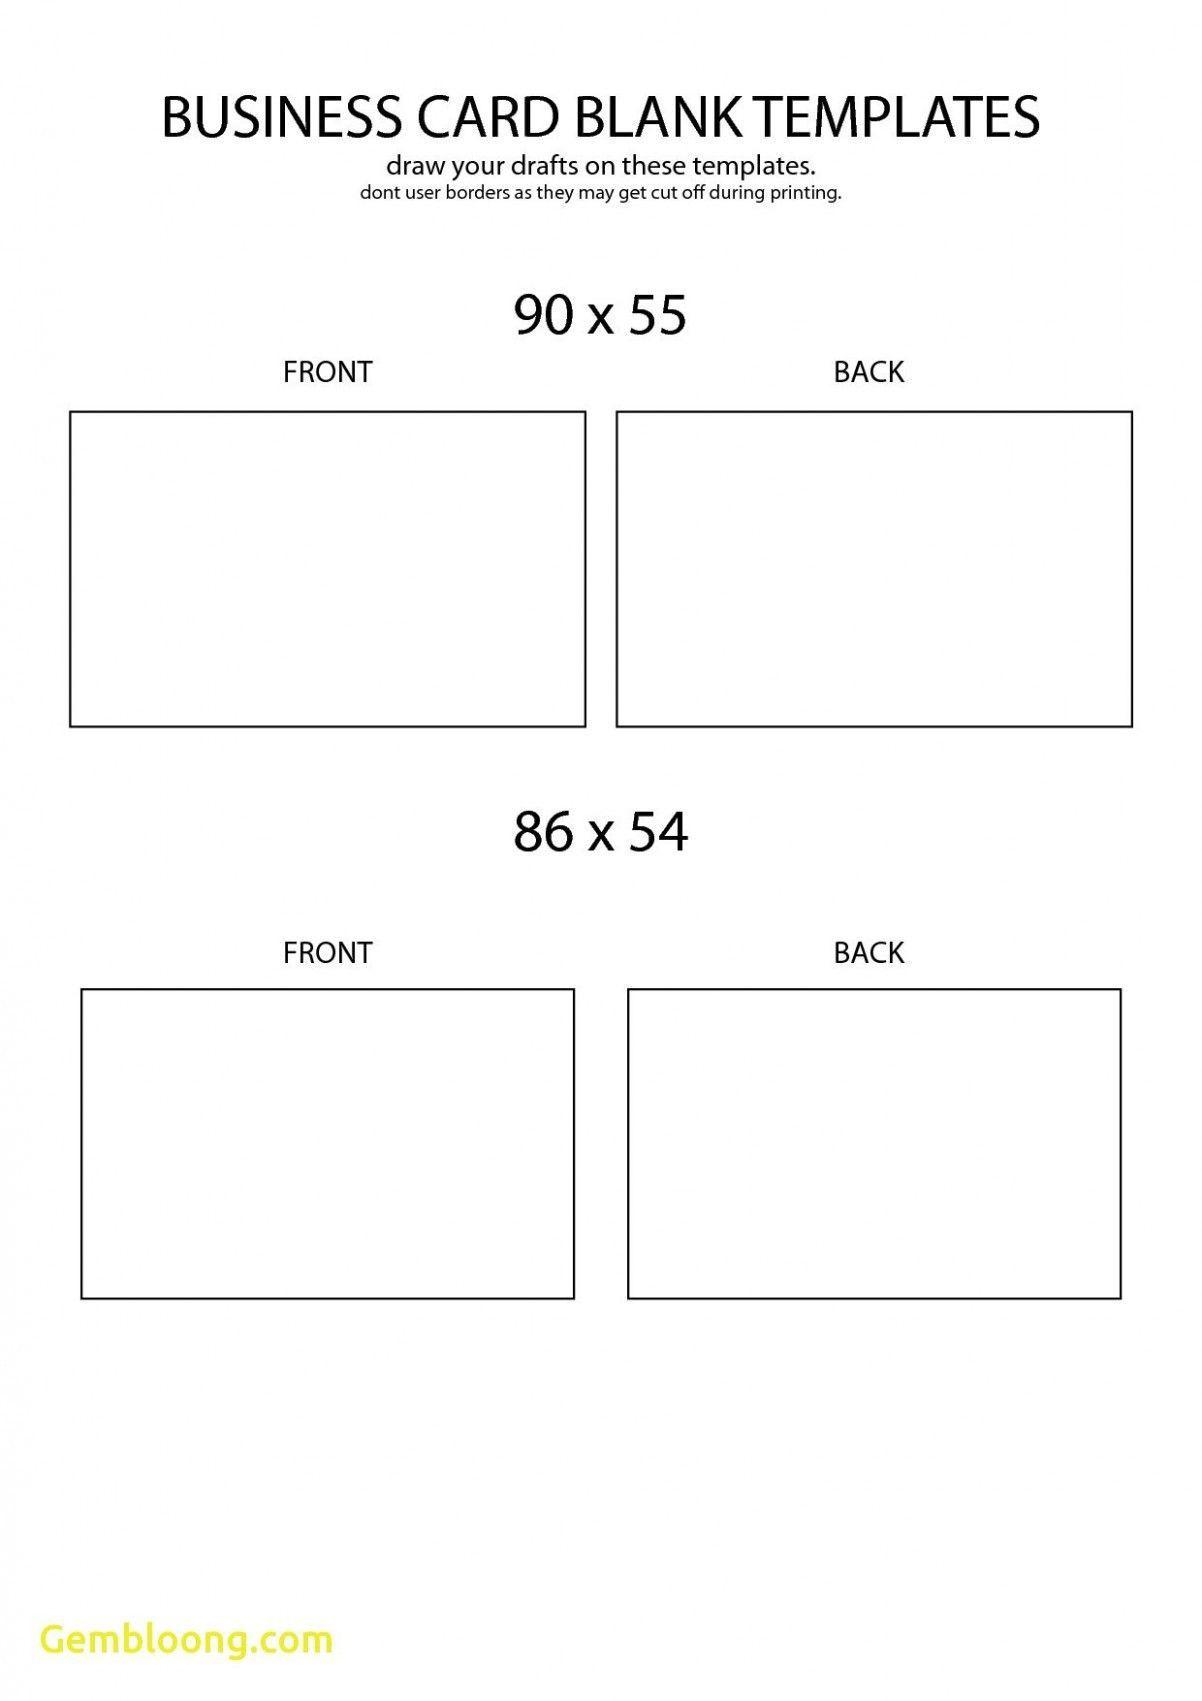 004 Wonderful Simple Busines Card Template Microsoft Word High Definition Full